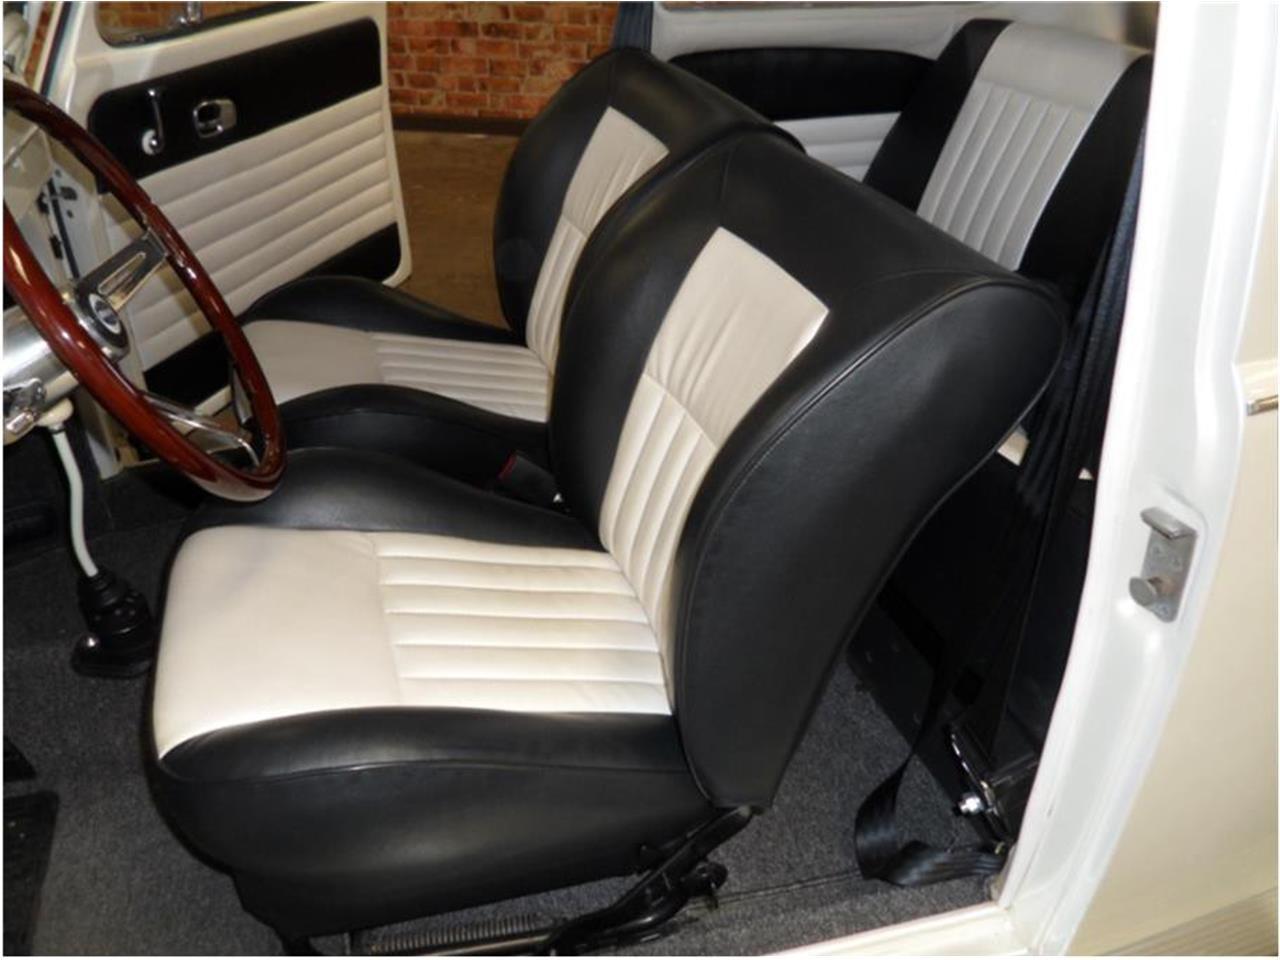 1967 Volkswagen Beetle (CC-1189869) for sale in Roseville, California